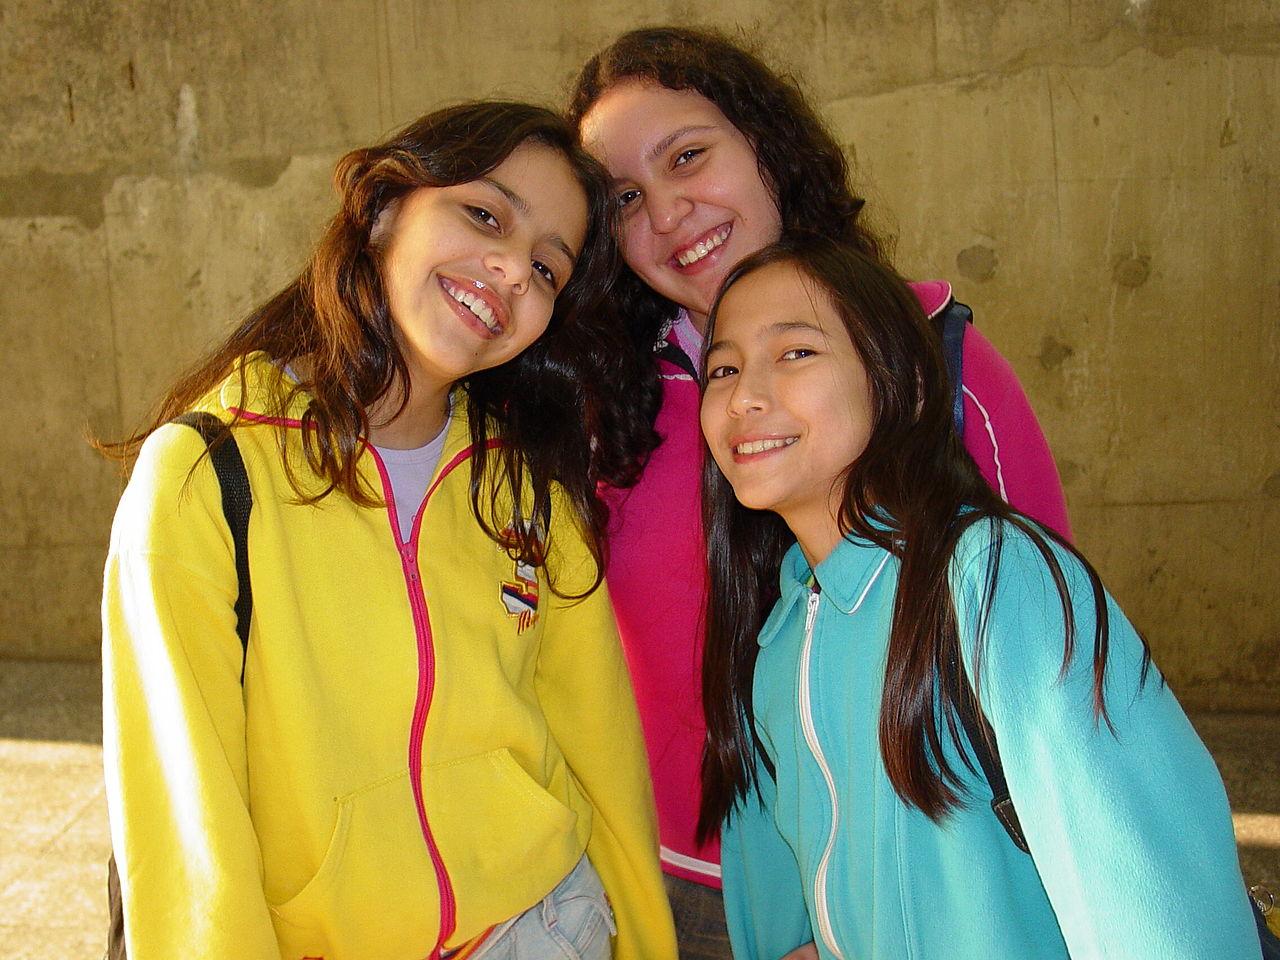 بالصور بنات برازيليات , صور بنات البرازيل 5958 10